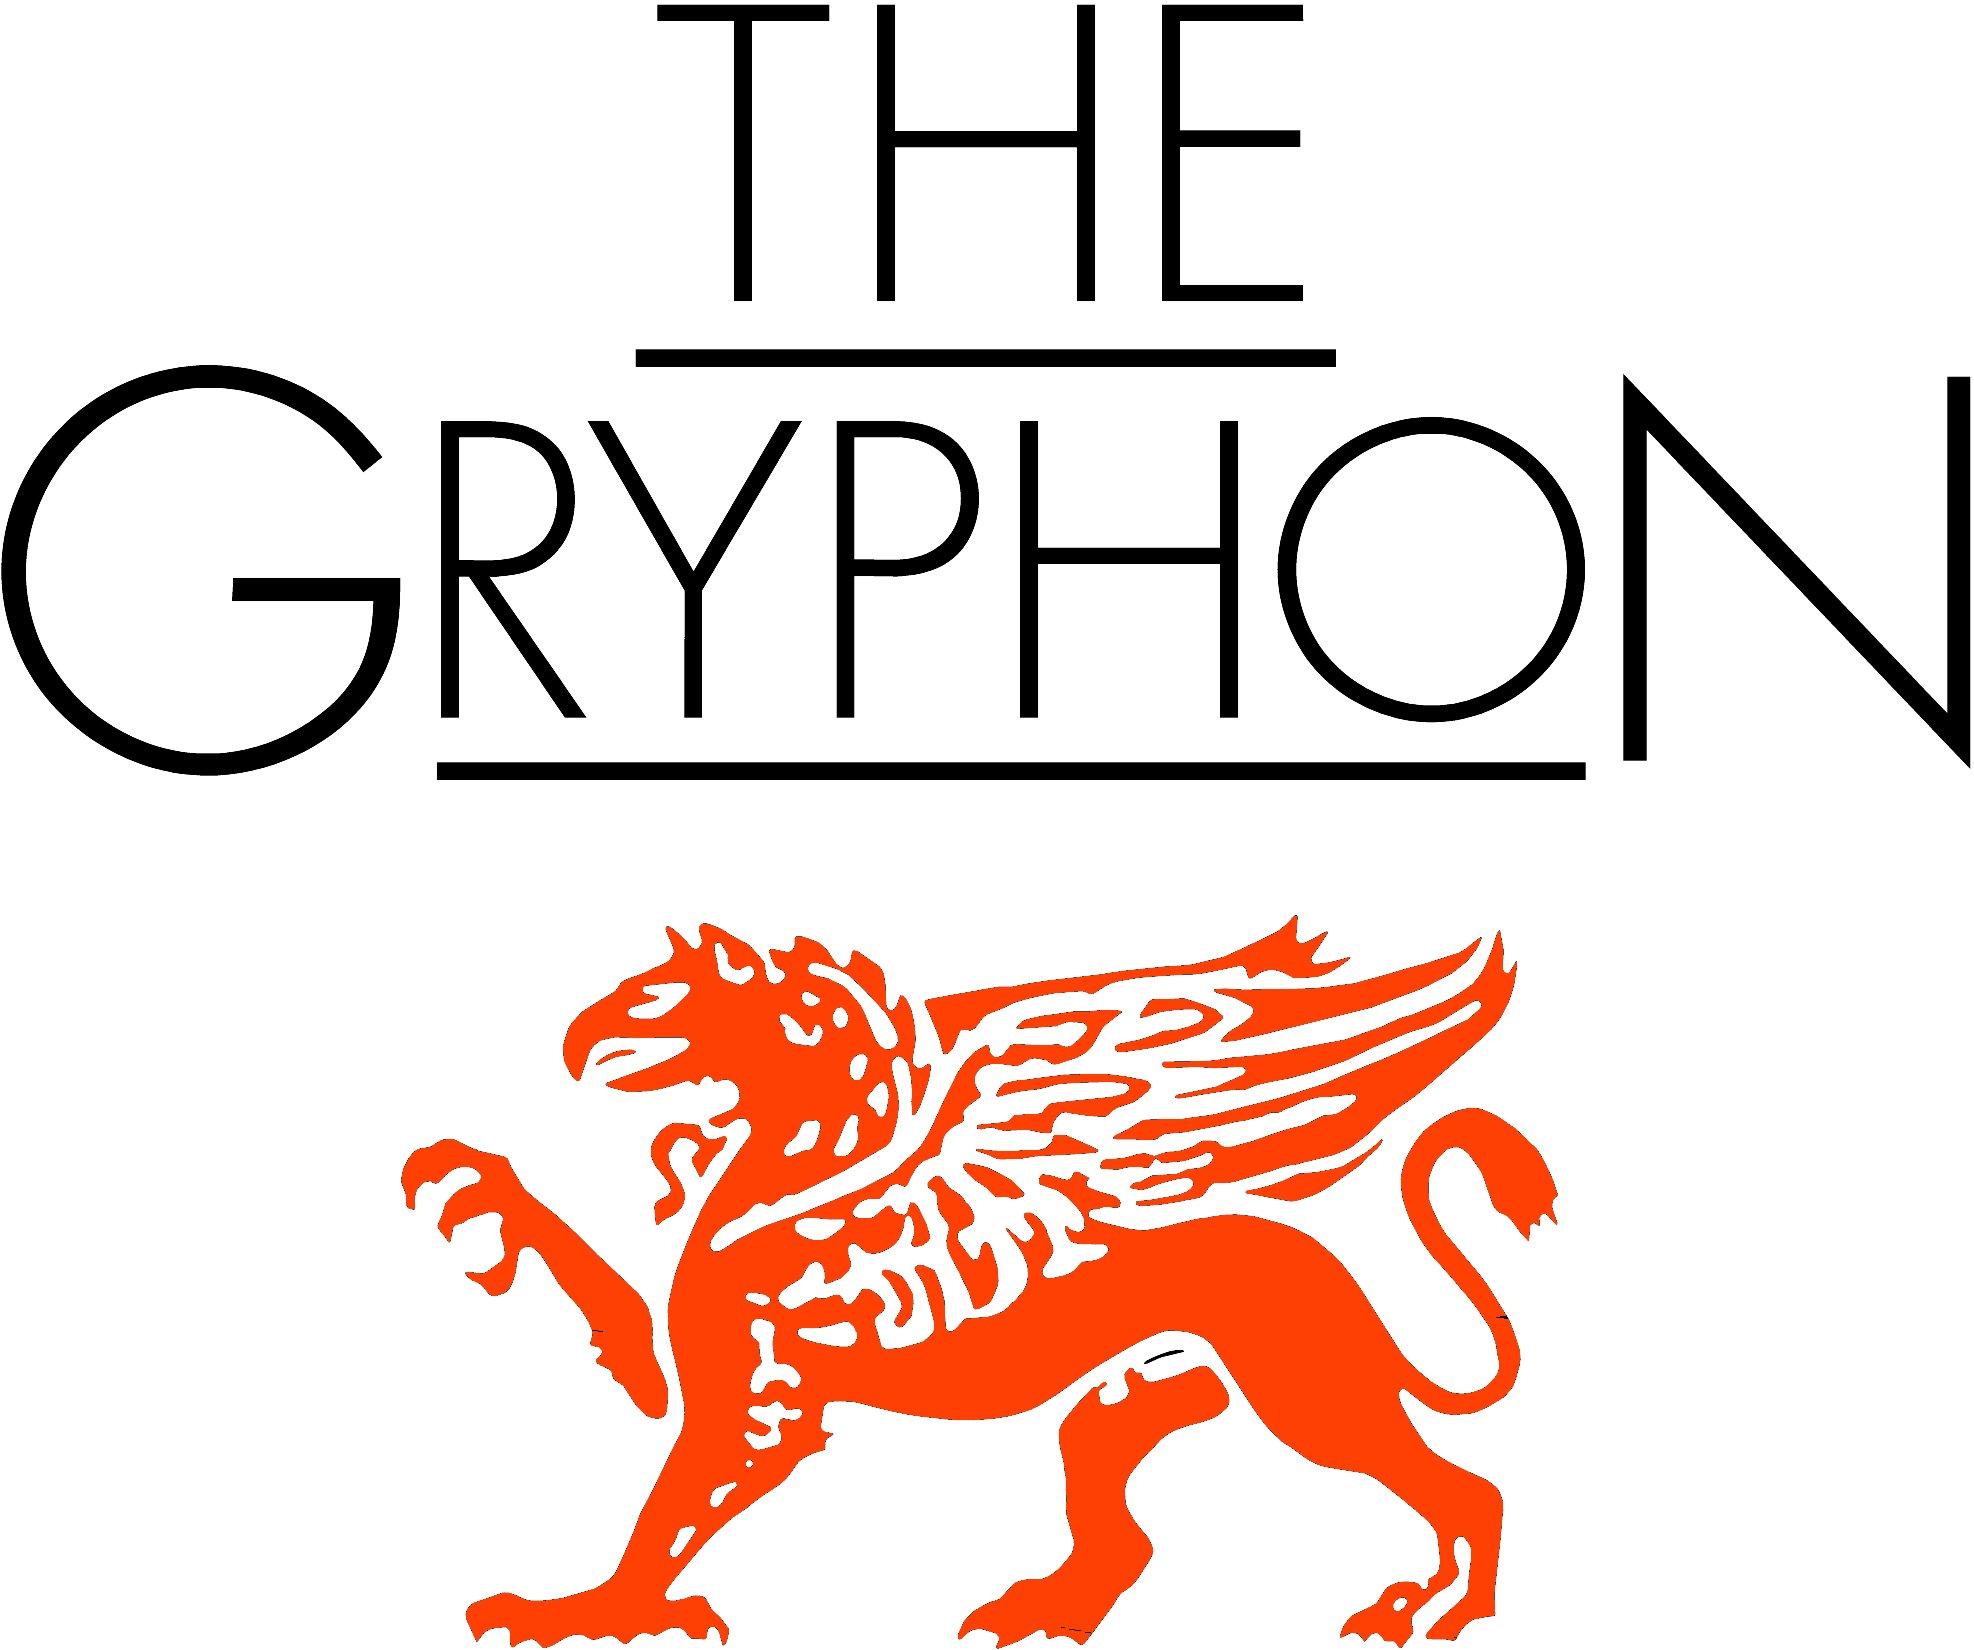 https://www.analogueseduction.net/user/products/large/Gryphon_RW_logo_210900.jpg